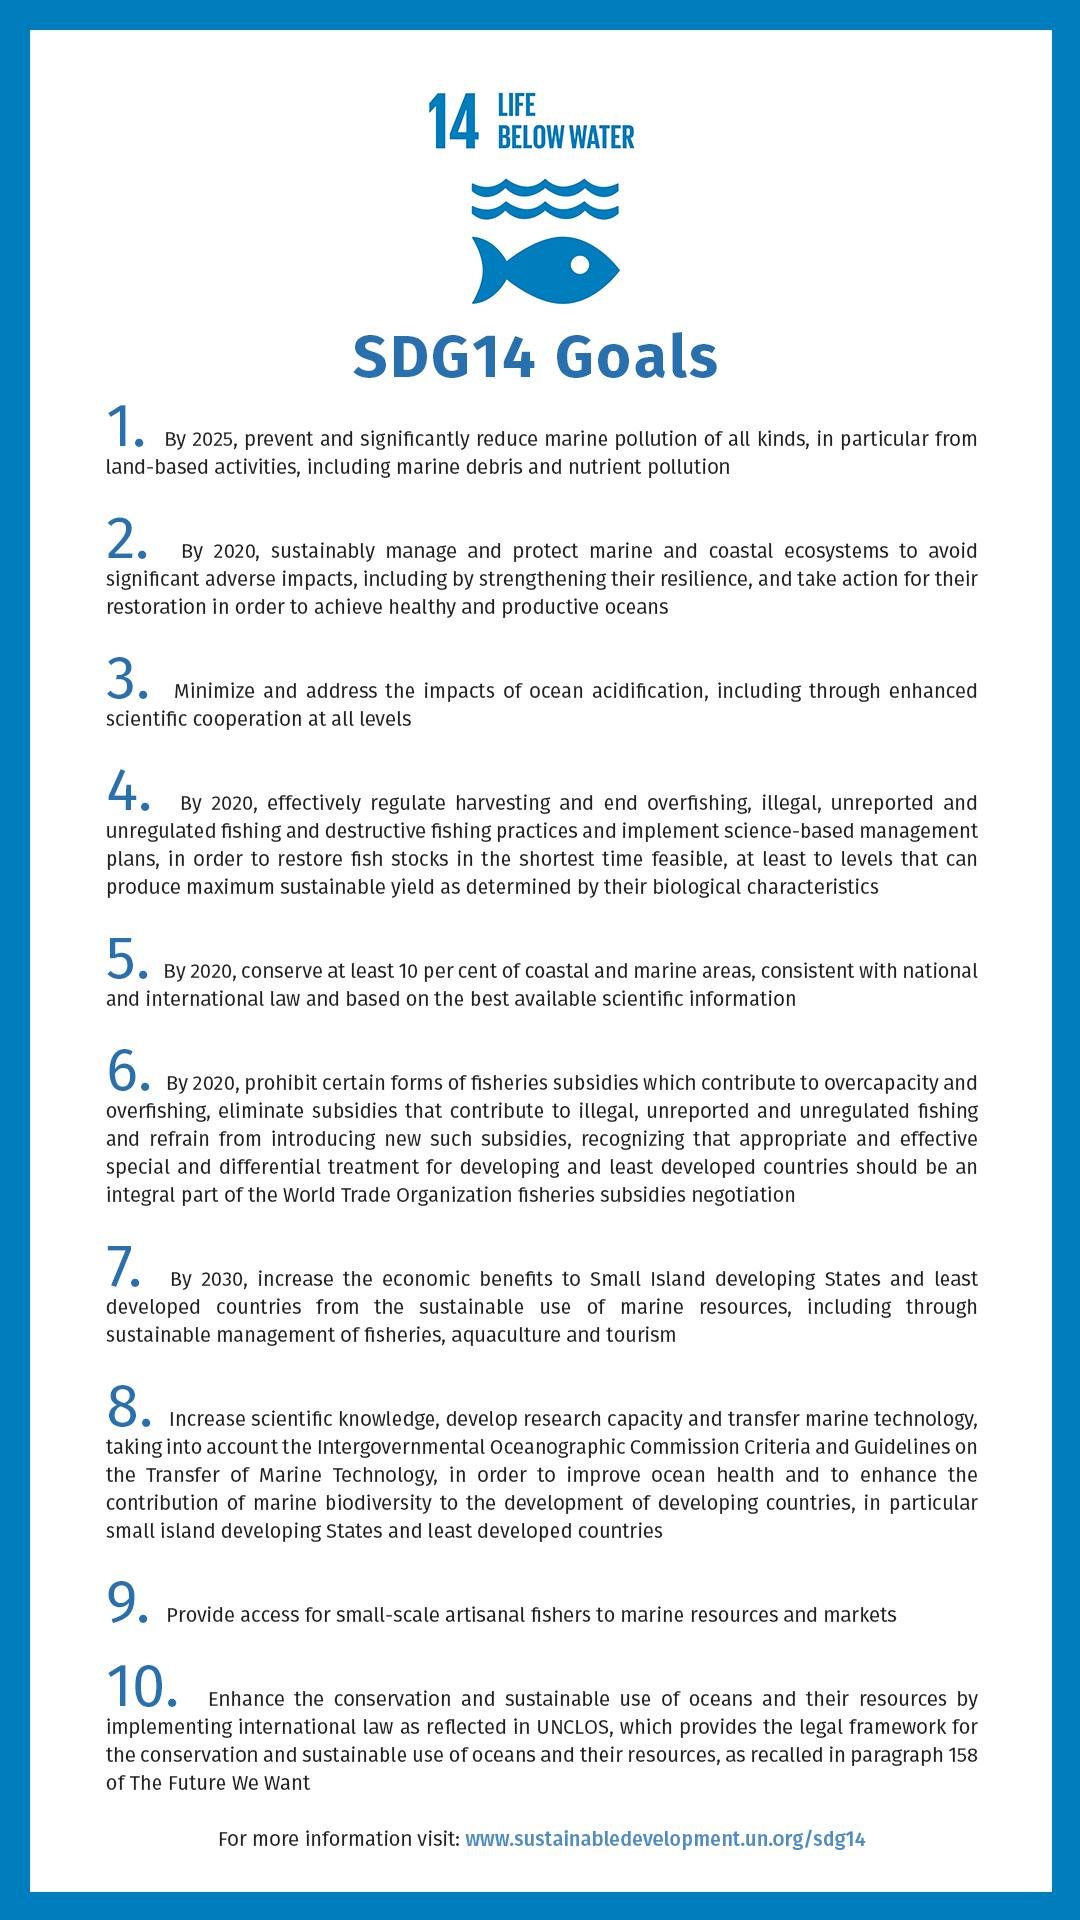 SDG14 Goals.jpg